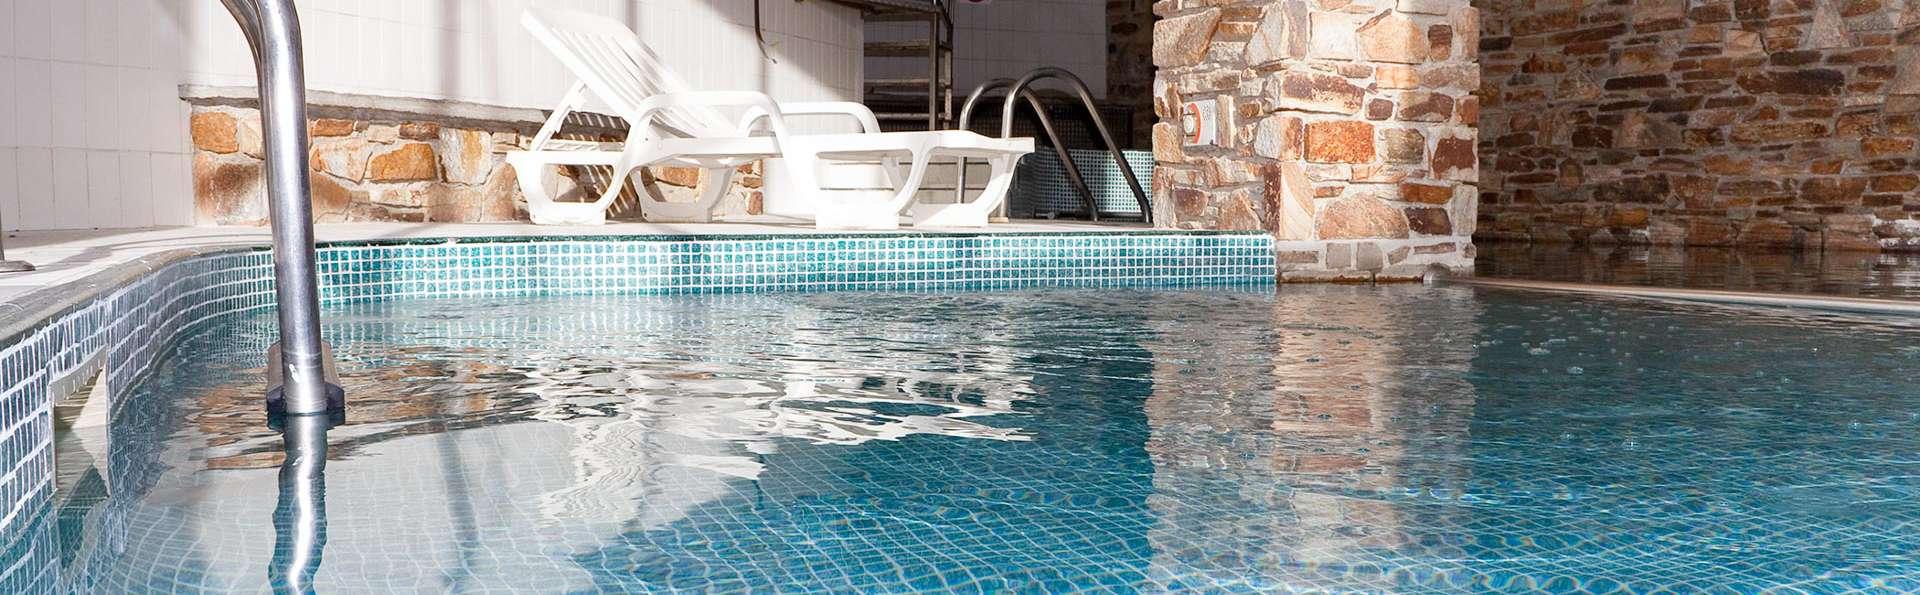 Hotel Solana Arinsal - EDIT_POOL_01.jpg